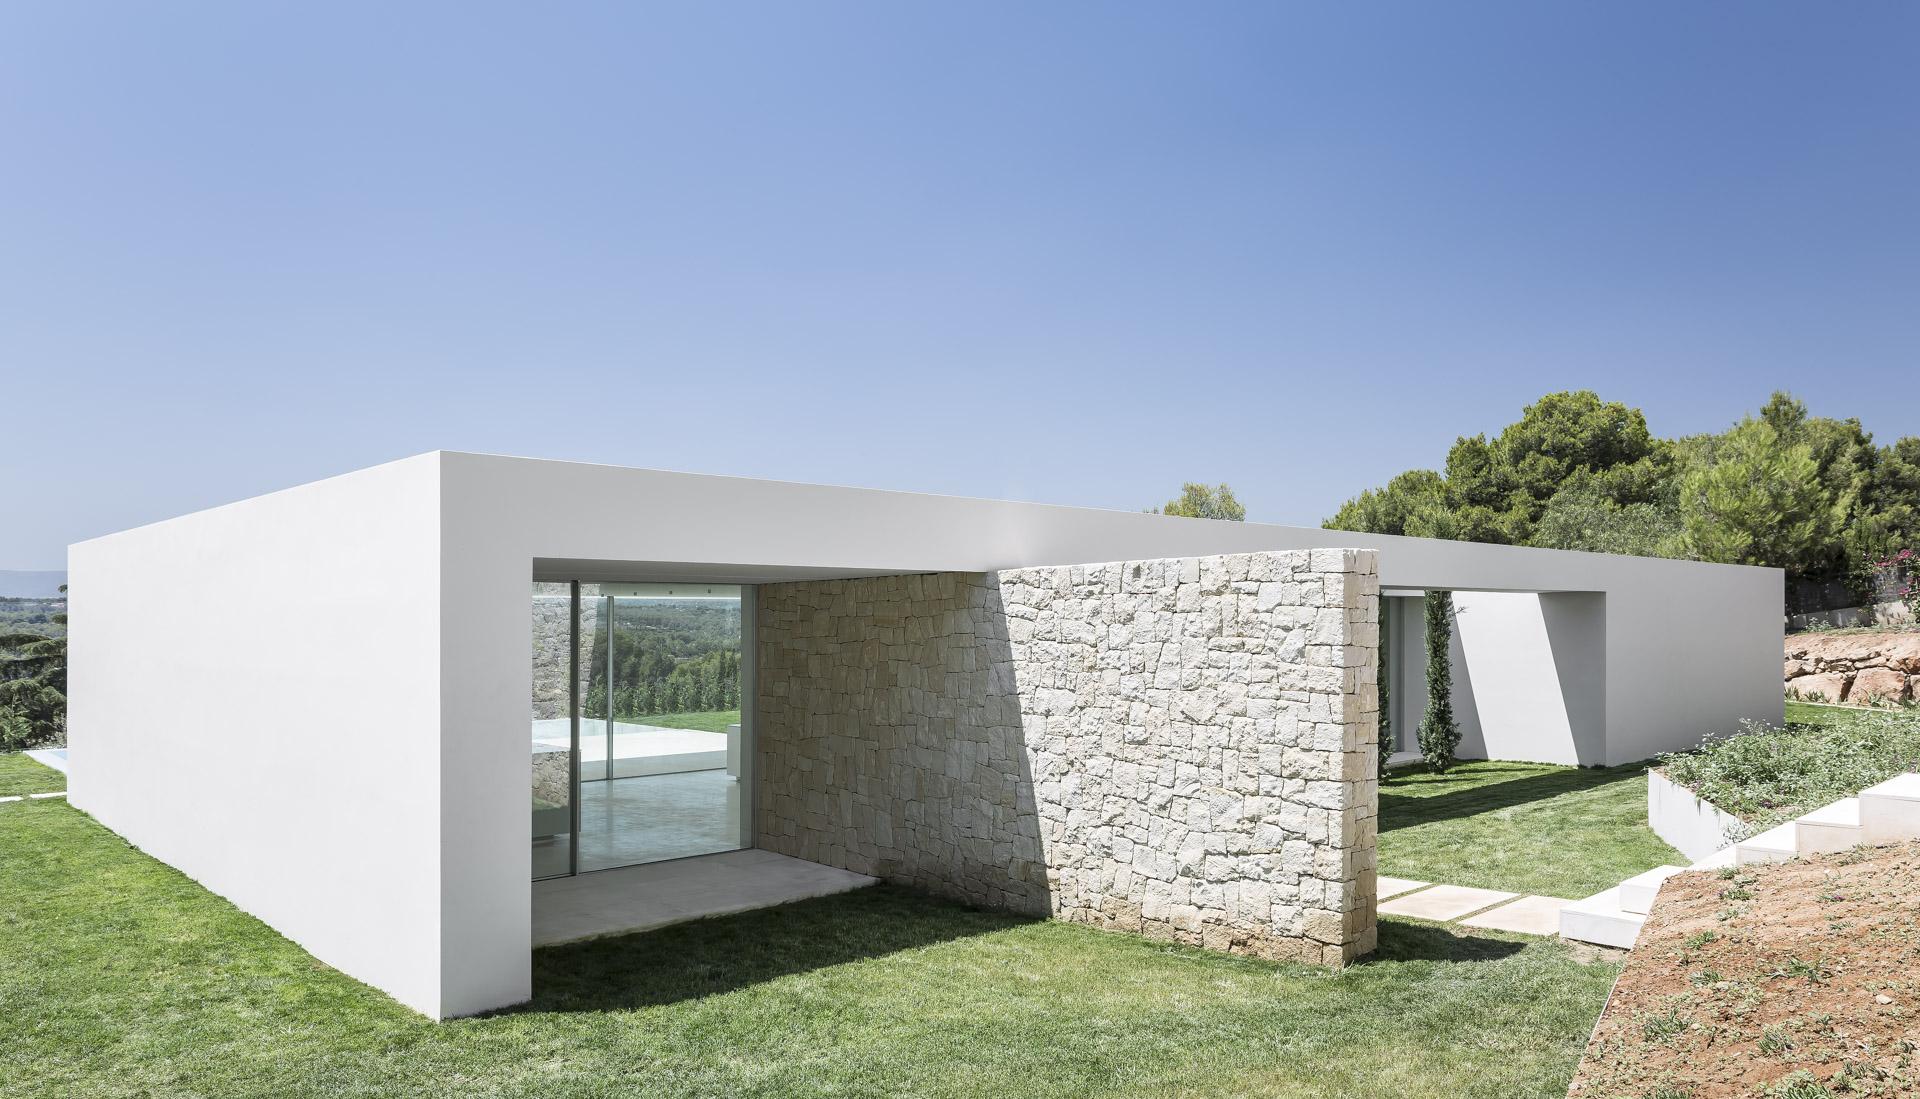 fotografia-arquitectura-valencia-german-cabo-gallardo-llopis-villamarchante-vivienda-03